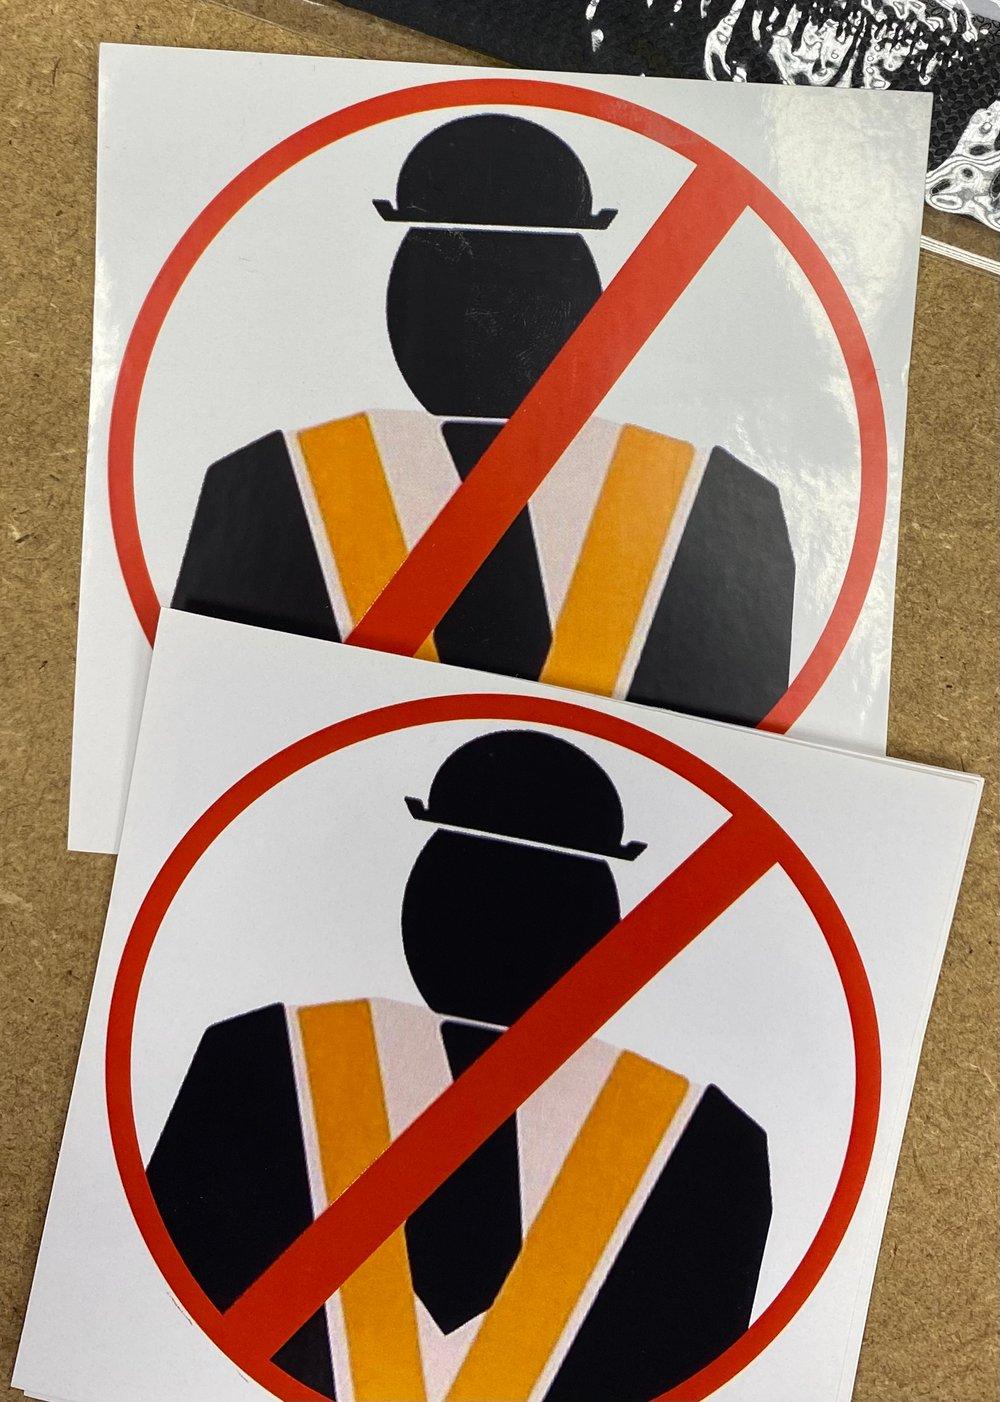 No Orange Men Stickers